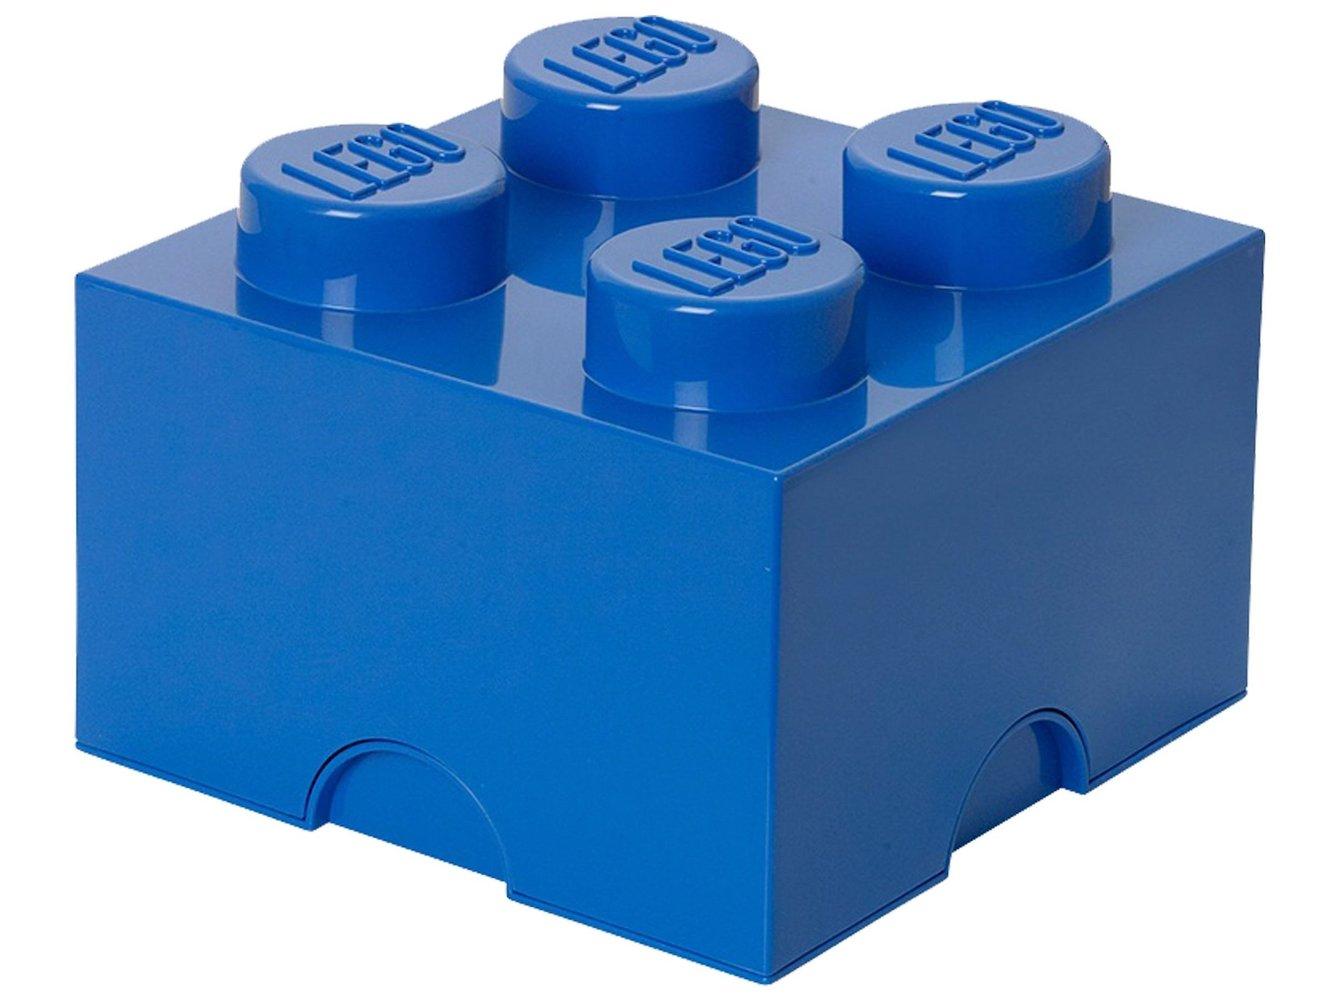 4 stud Blue Storage Brick